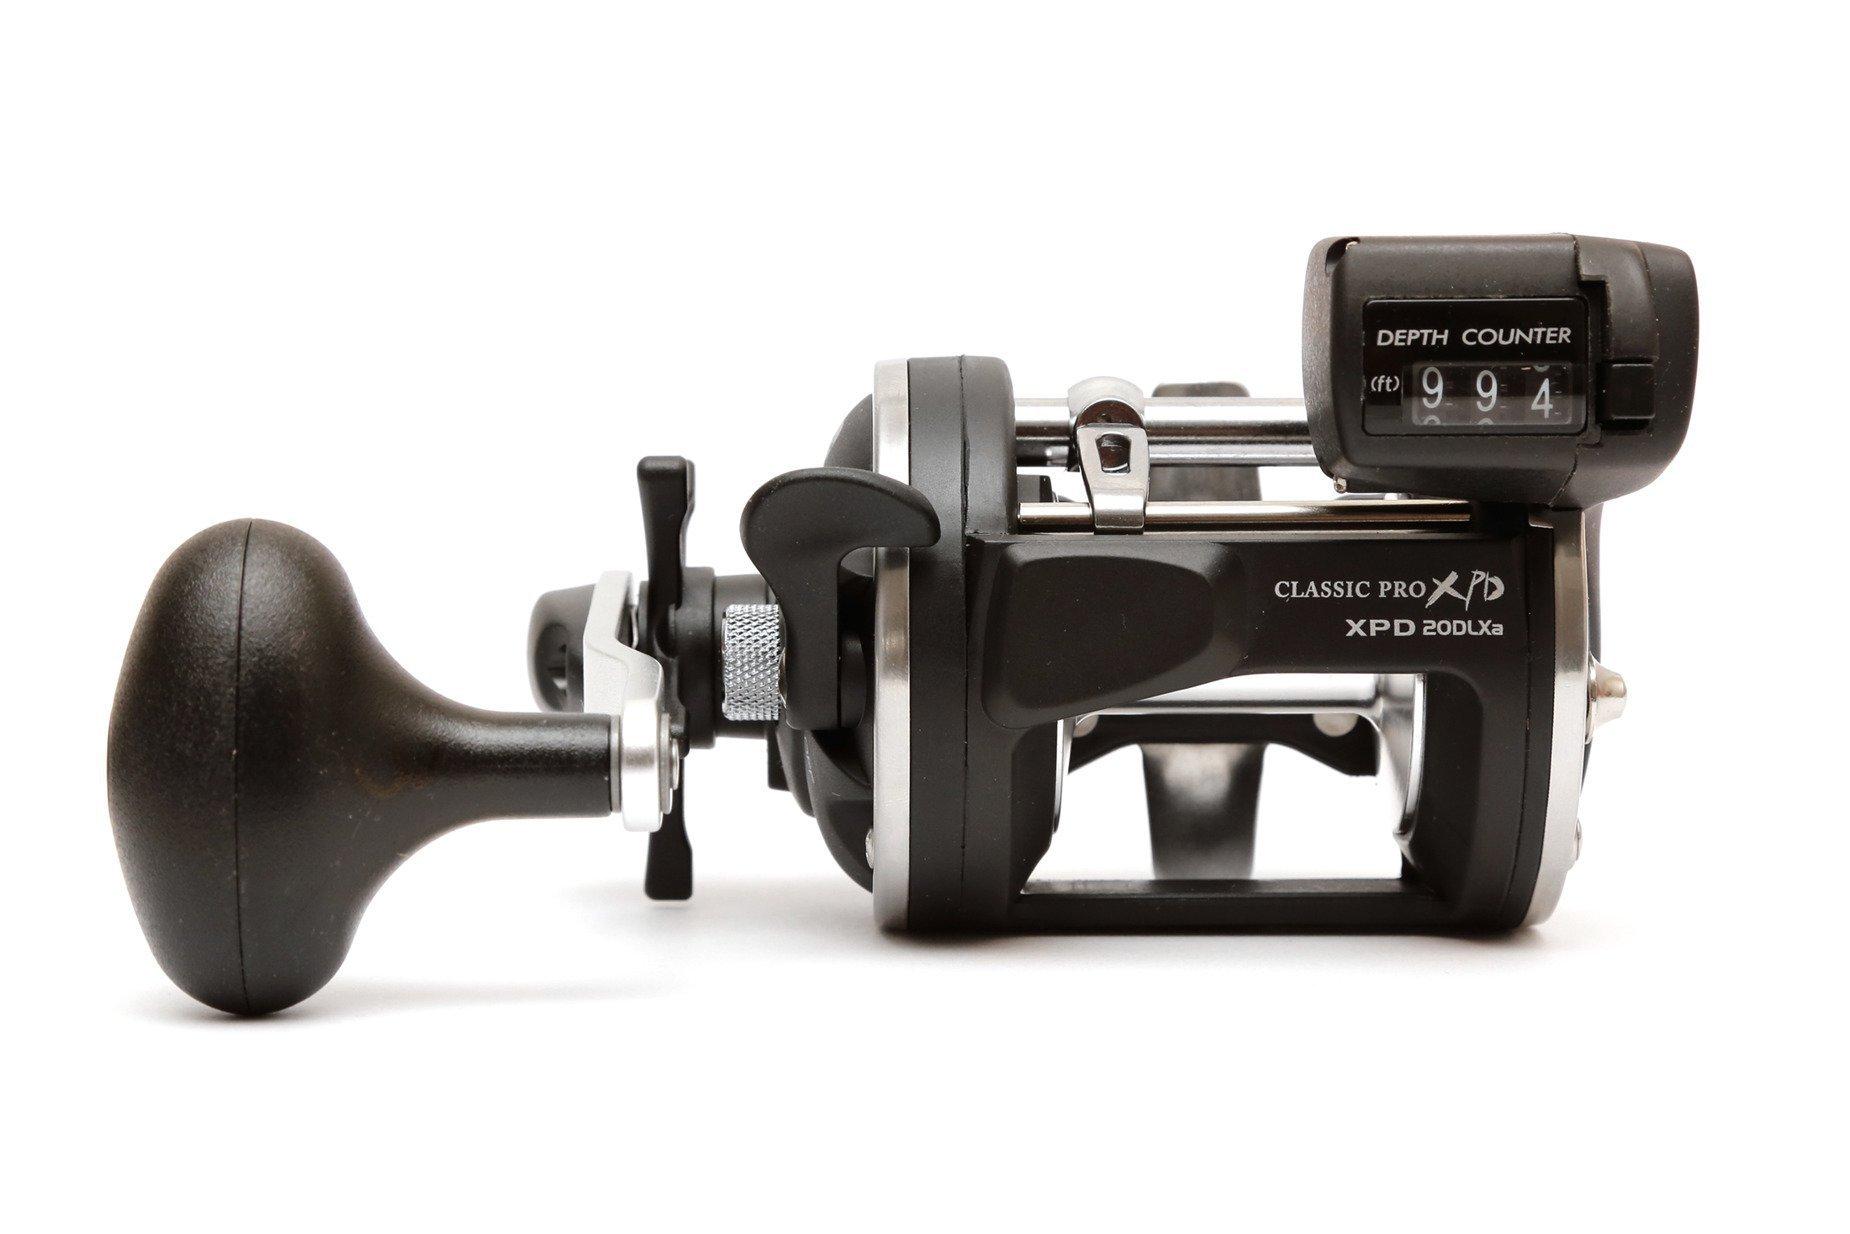 Okuma Classic Linecounter Xpd 20dlxa